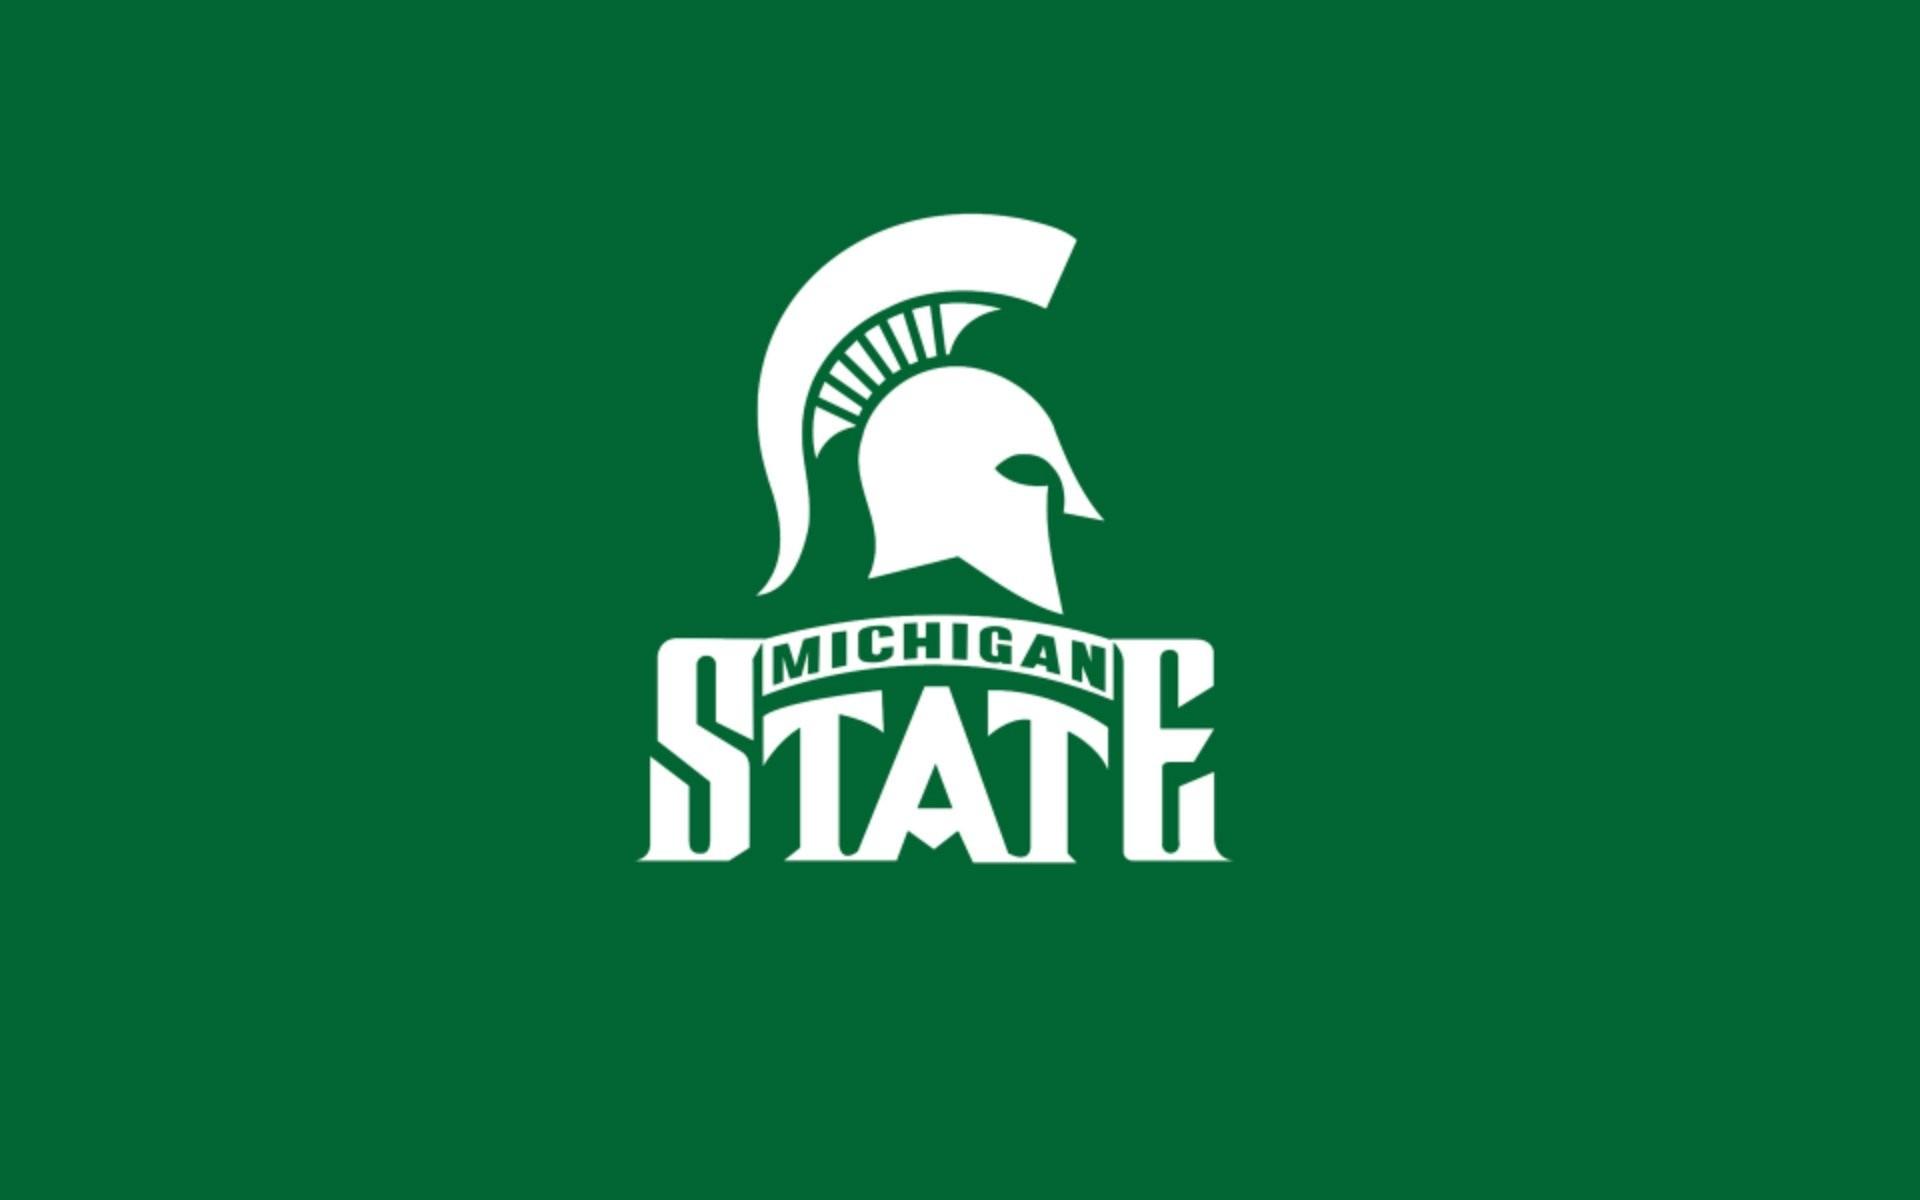 Michigan state logo wallpaper 63 images michigan state desktop background 0 html code sportz overtime buycottarizona